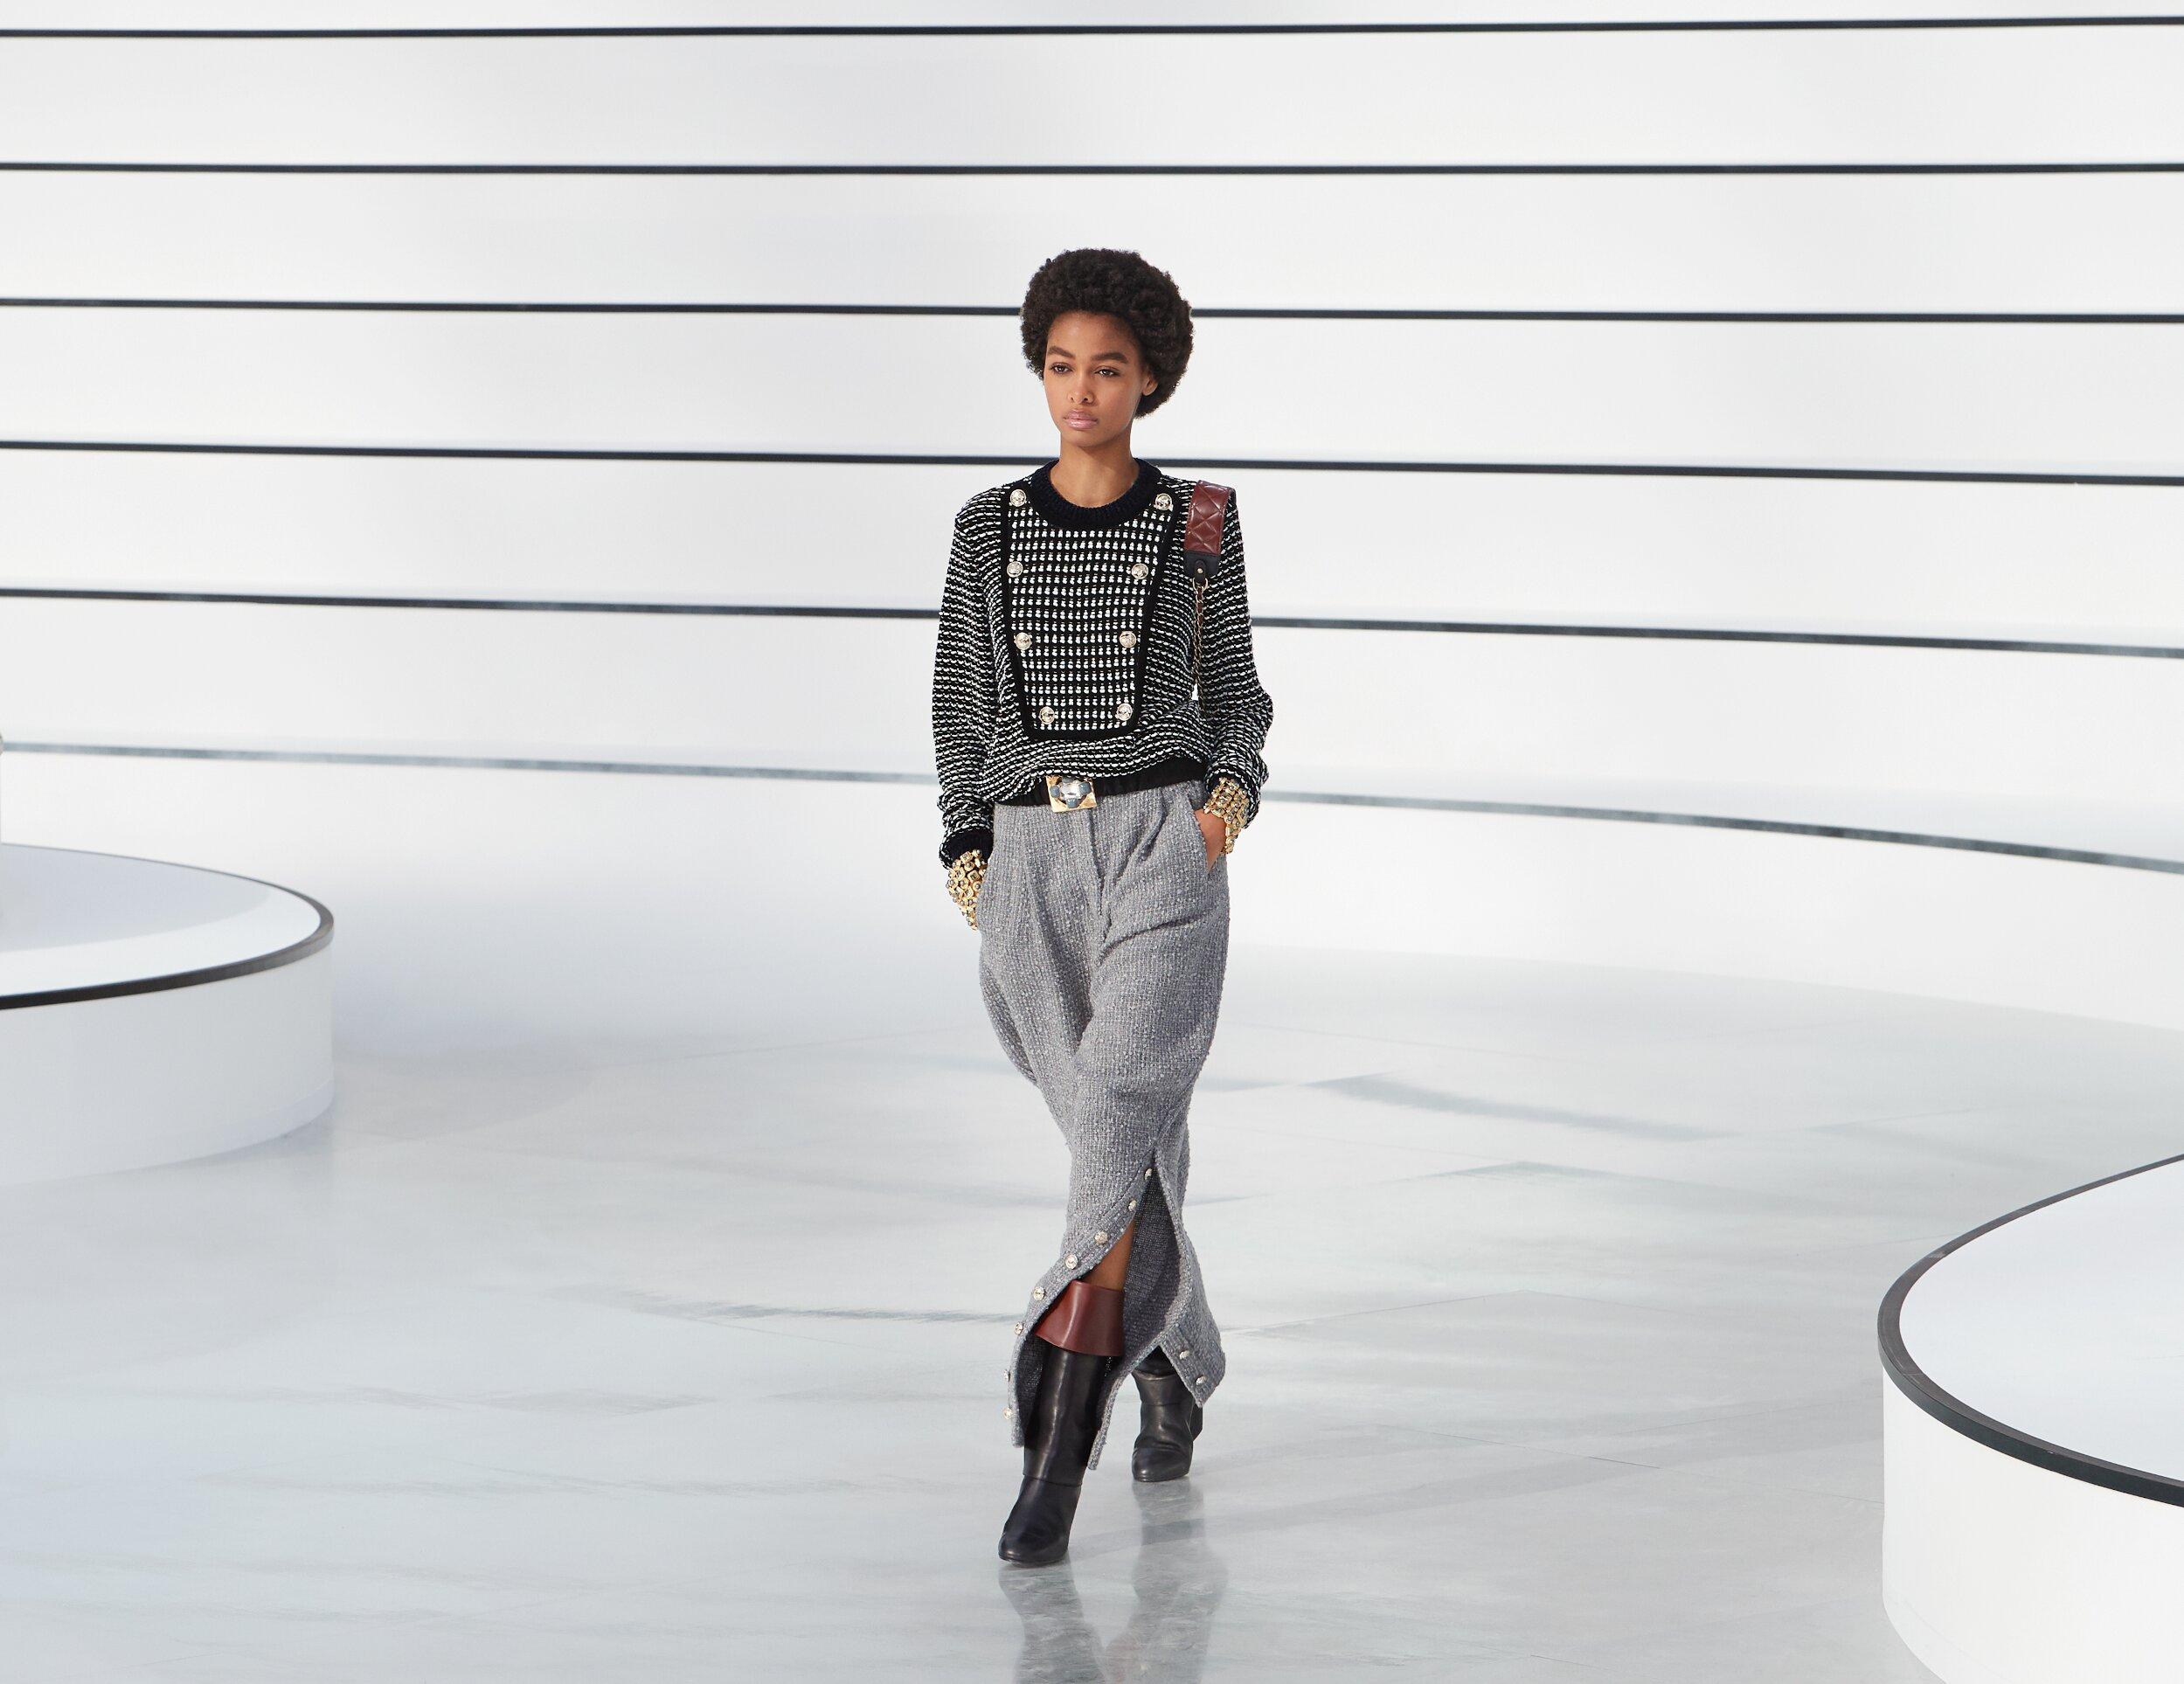 Woman FW 2020 Chanel